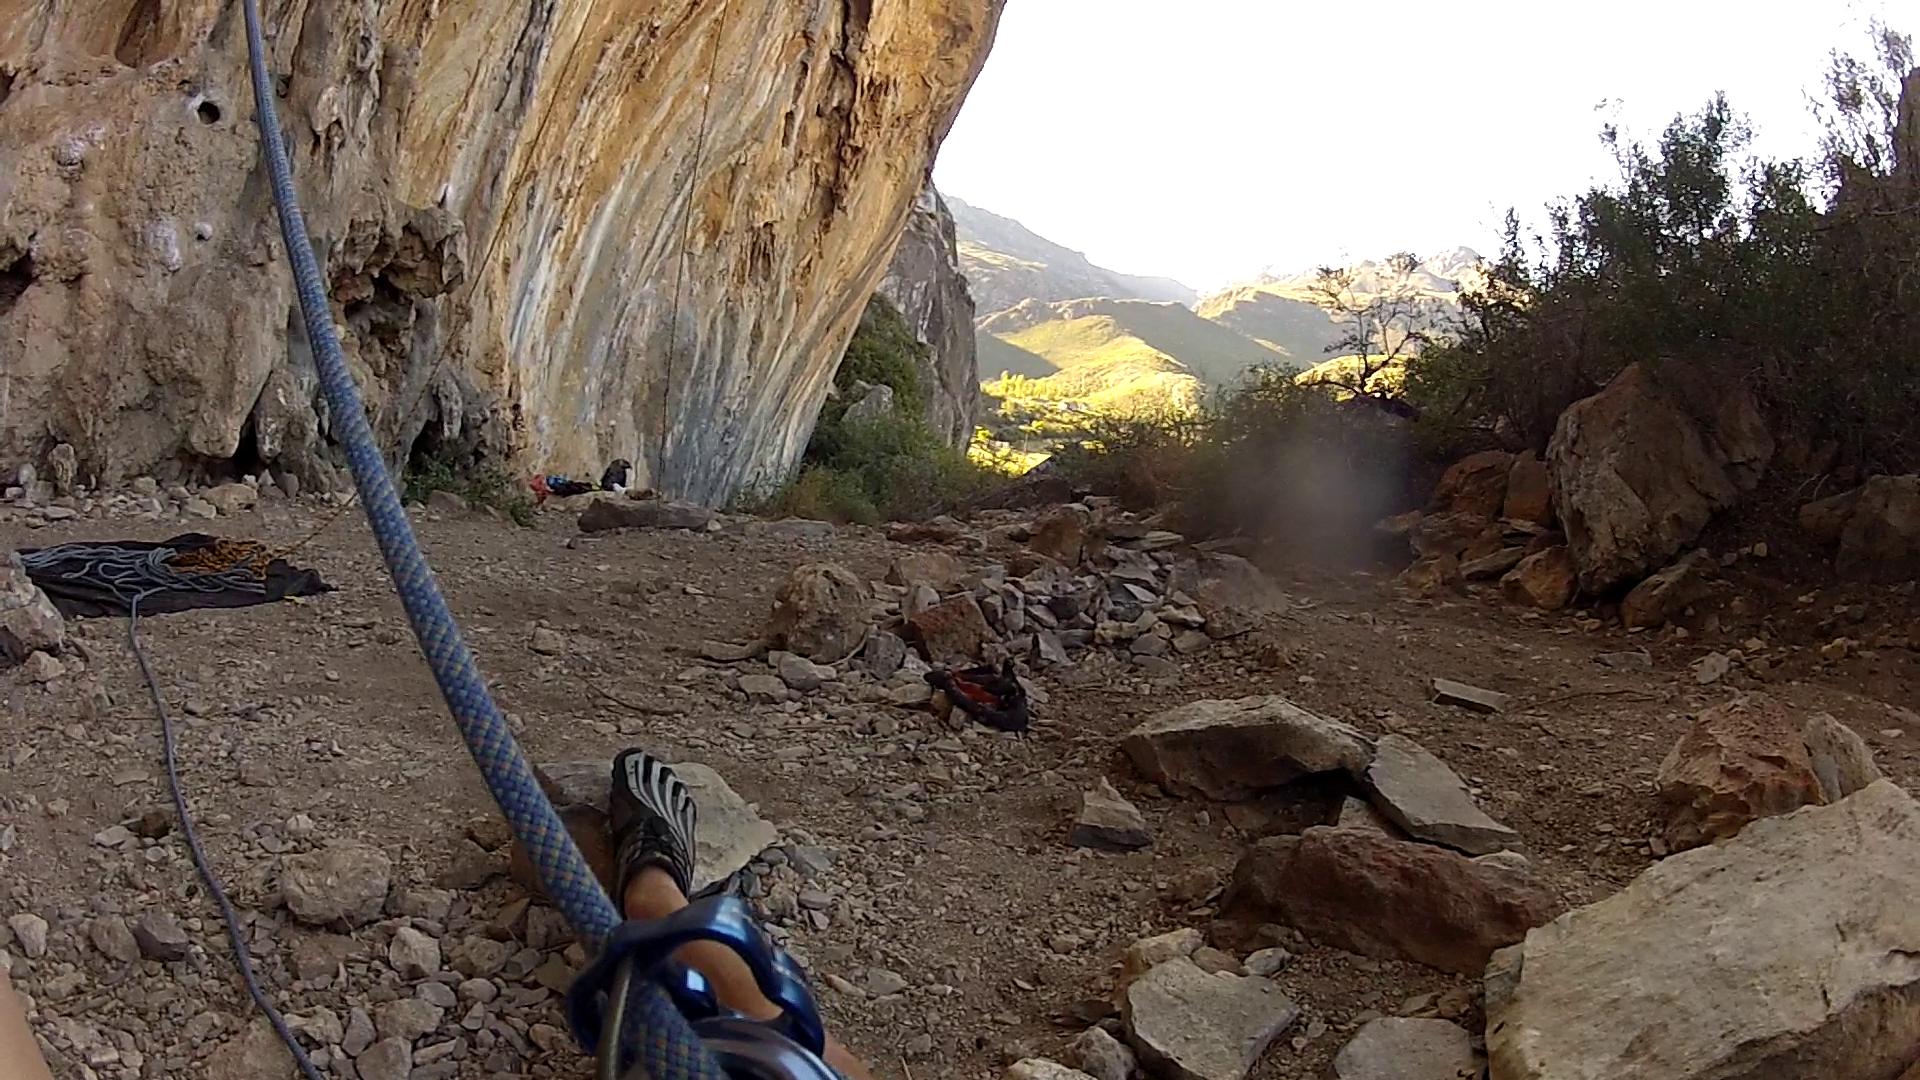 Vibram rockclimbing